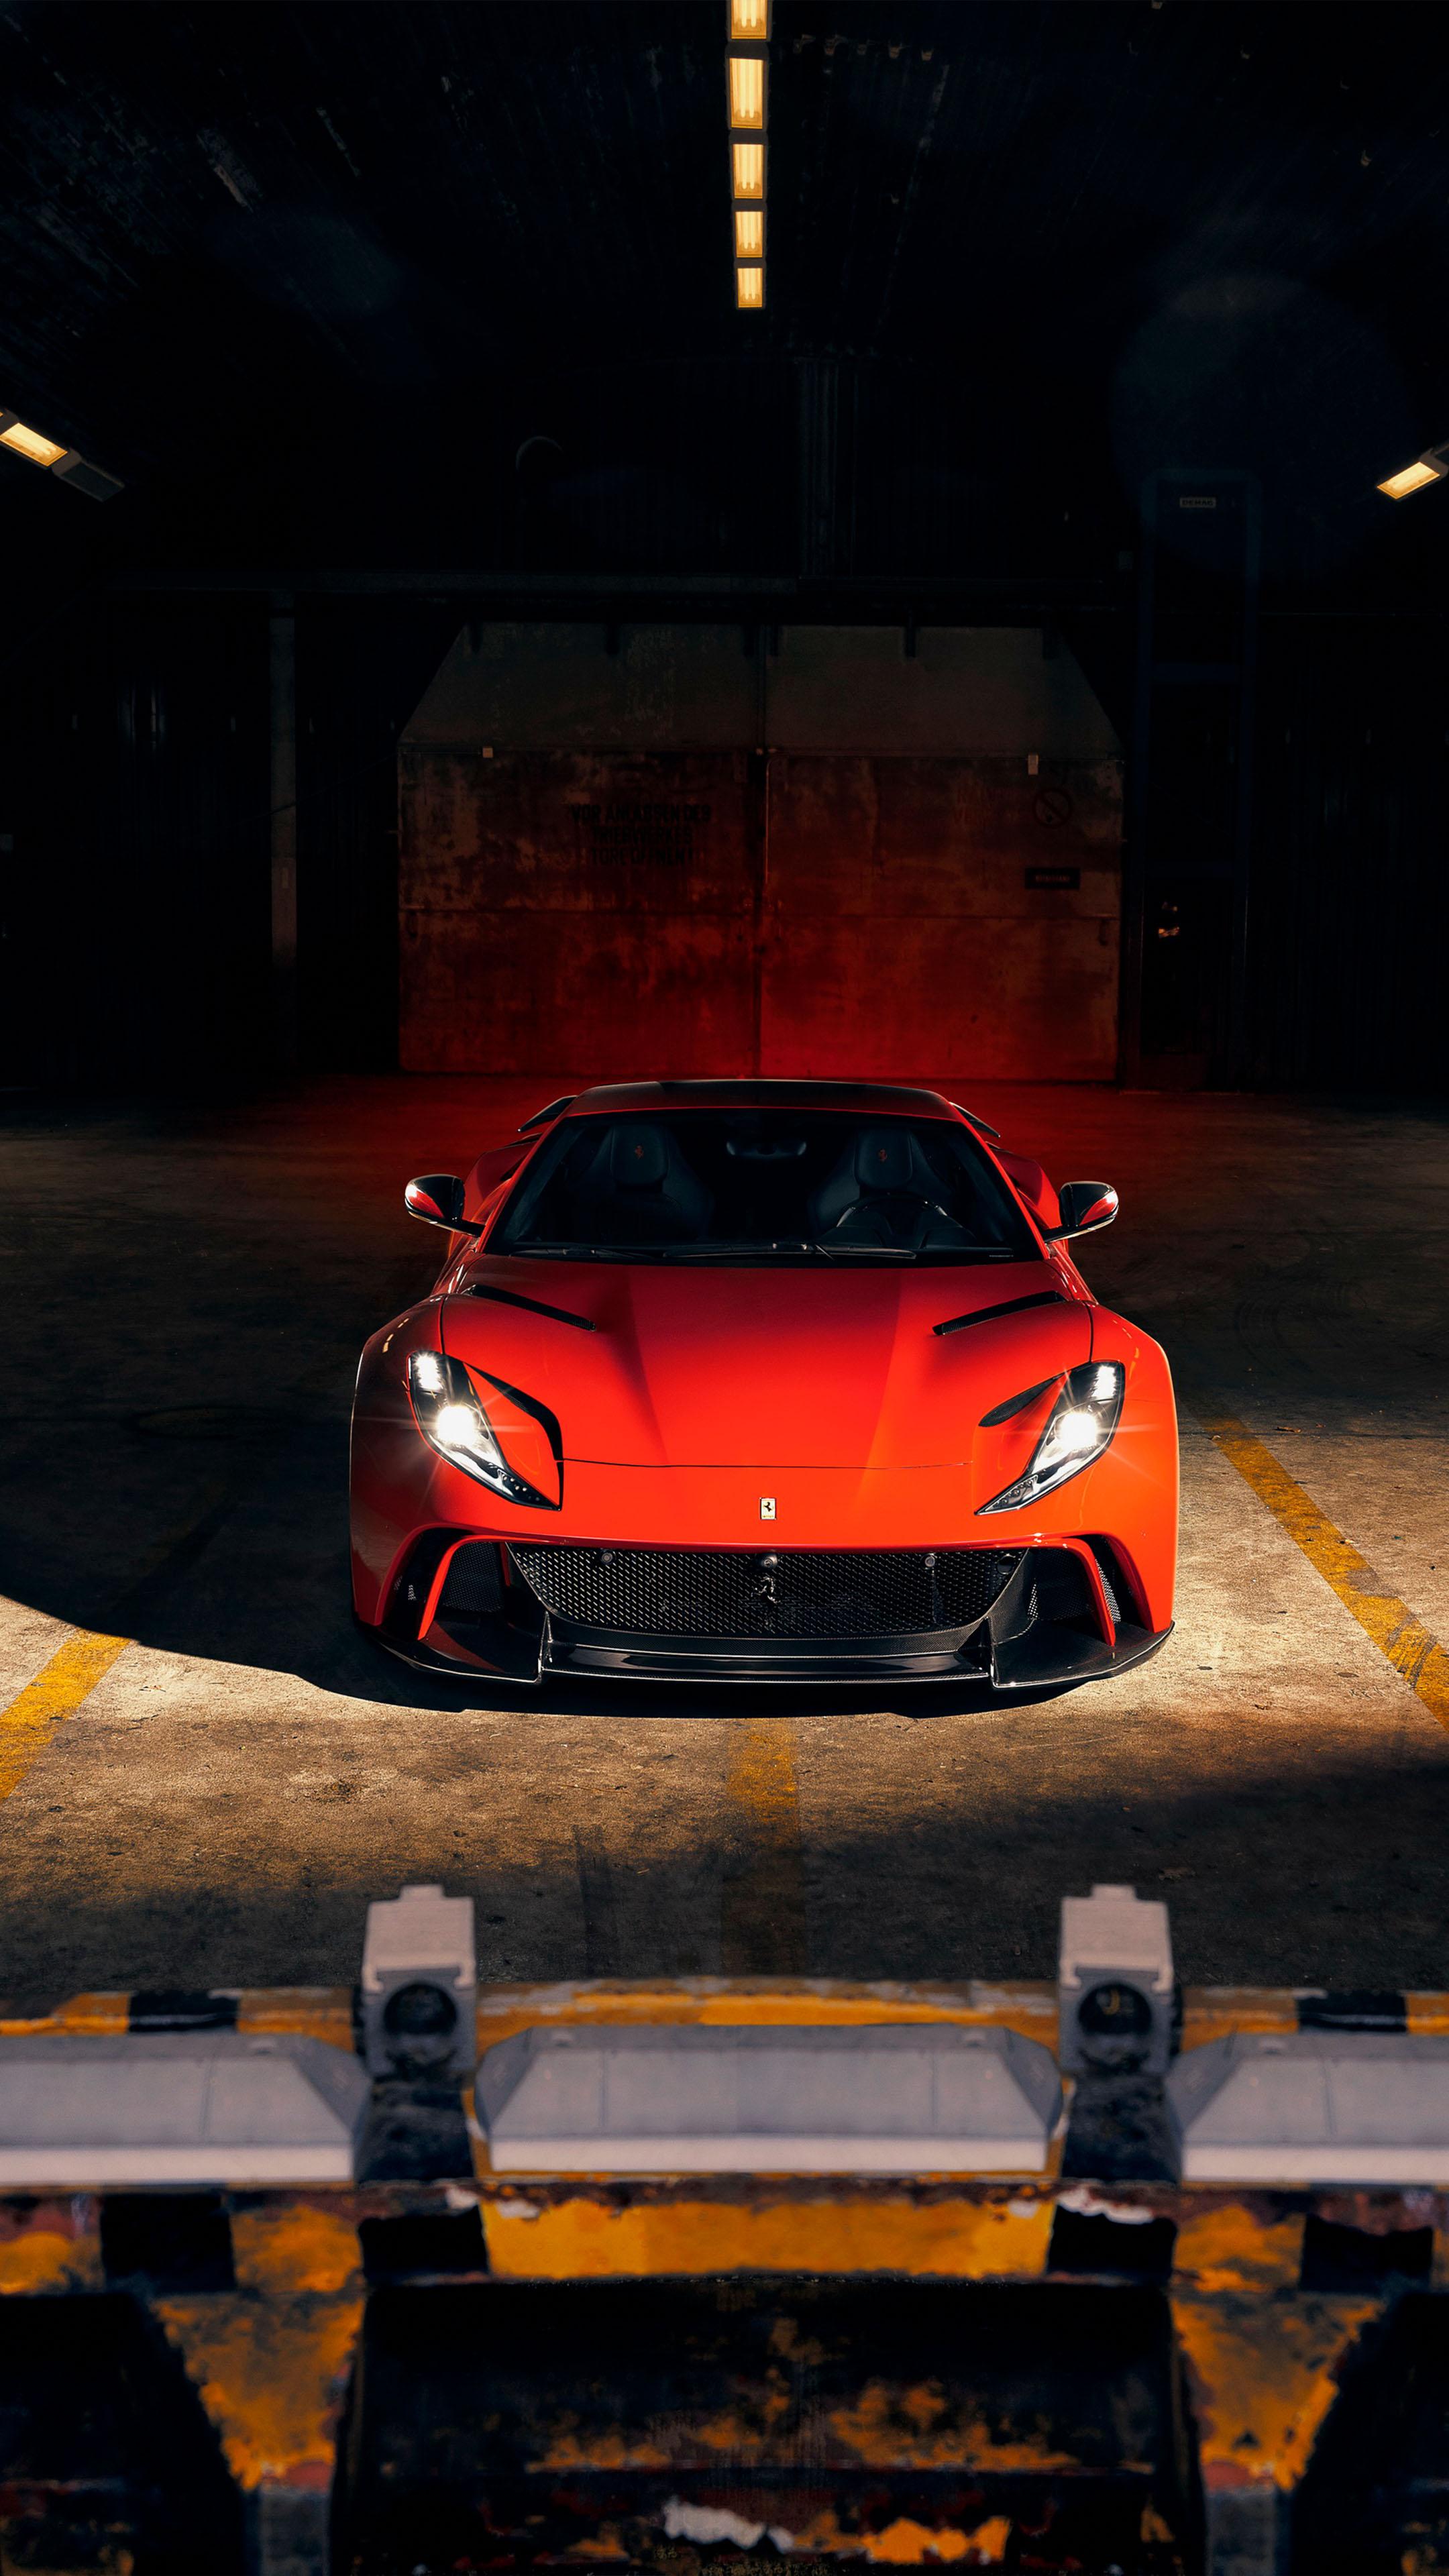 Ferrari 812 N Largo 2160x3840 Download Hd Wallpaper Wallpapertip